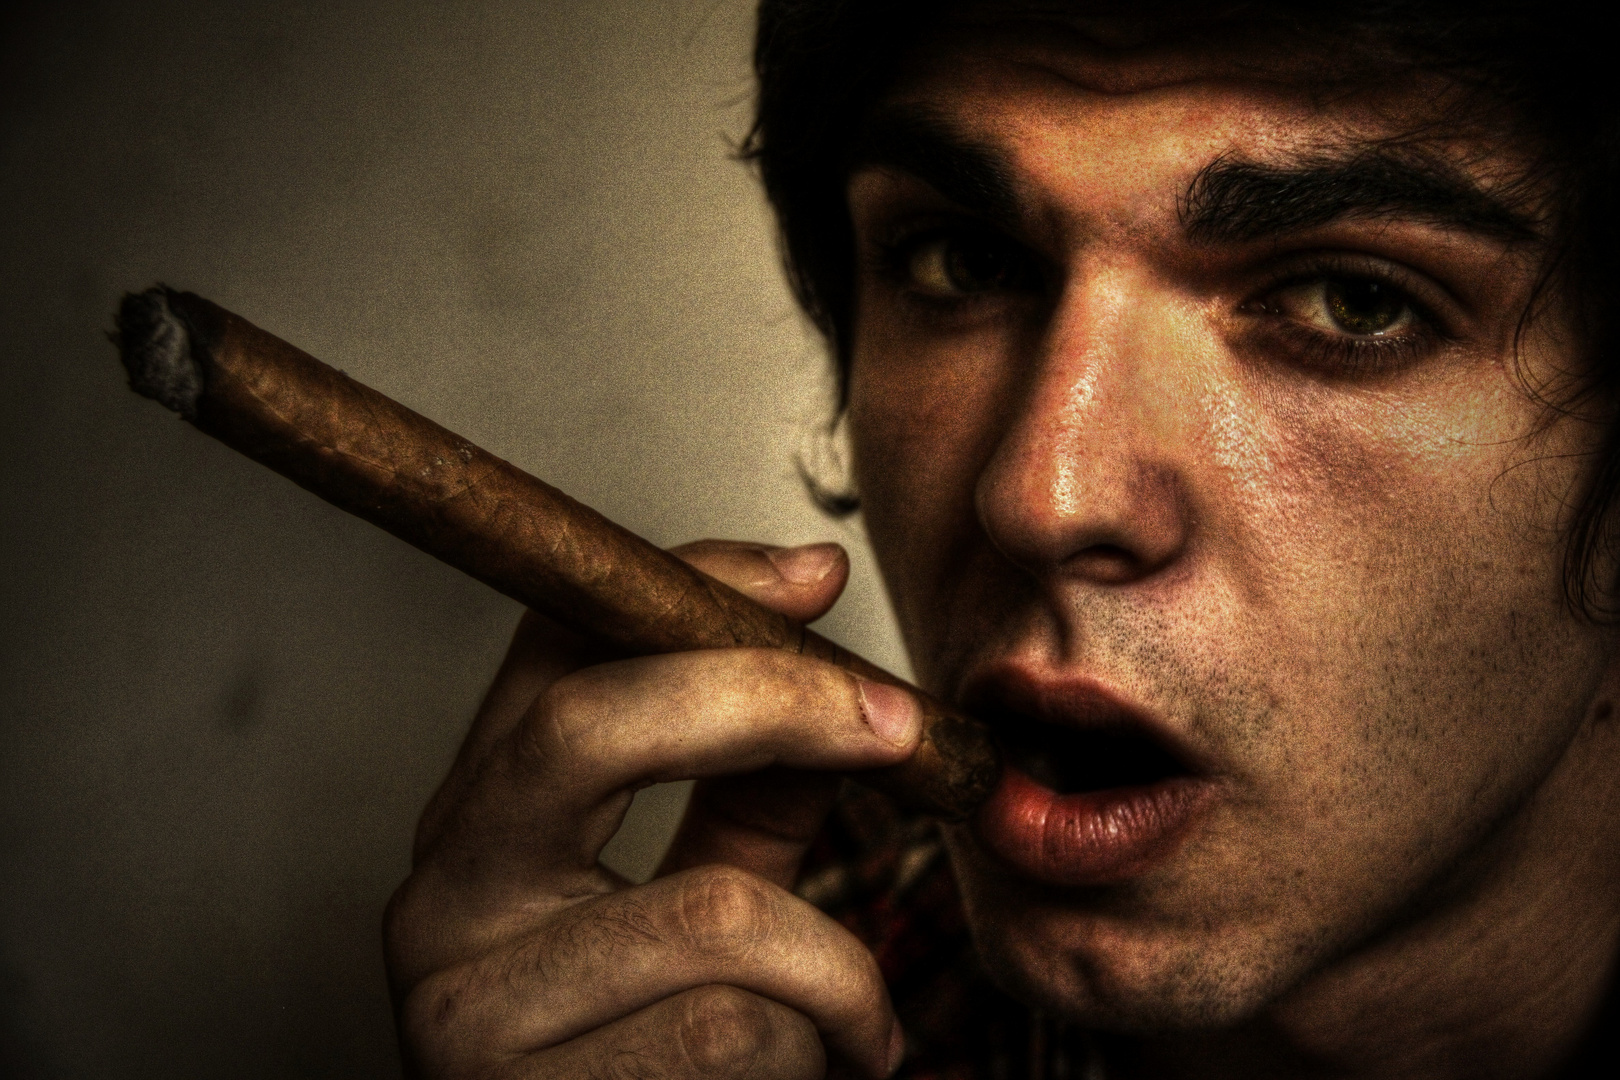 C pour cigare.